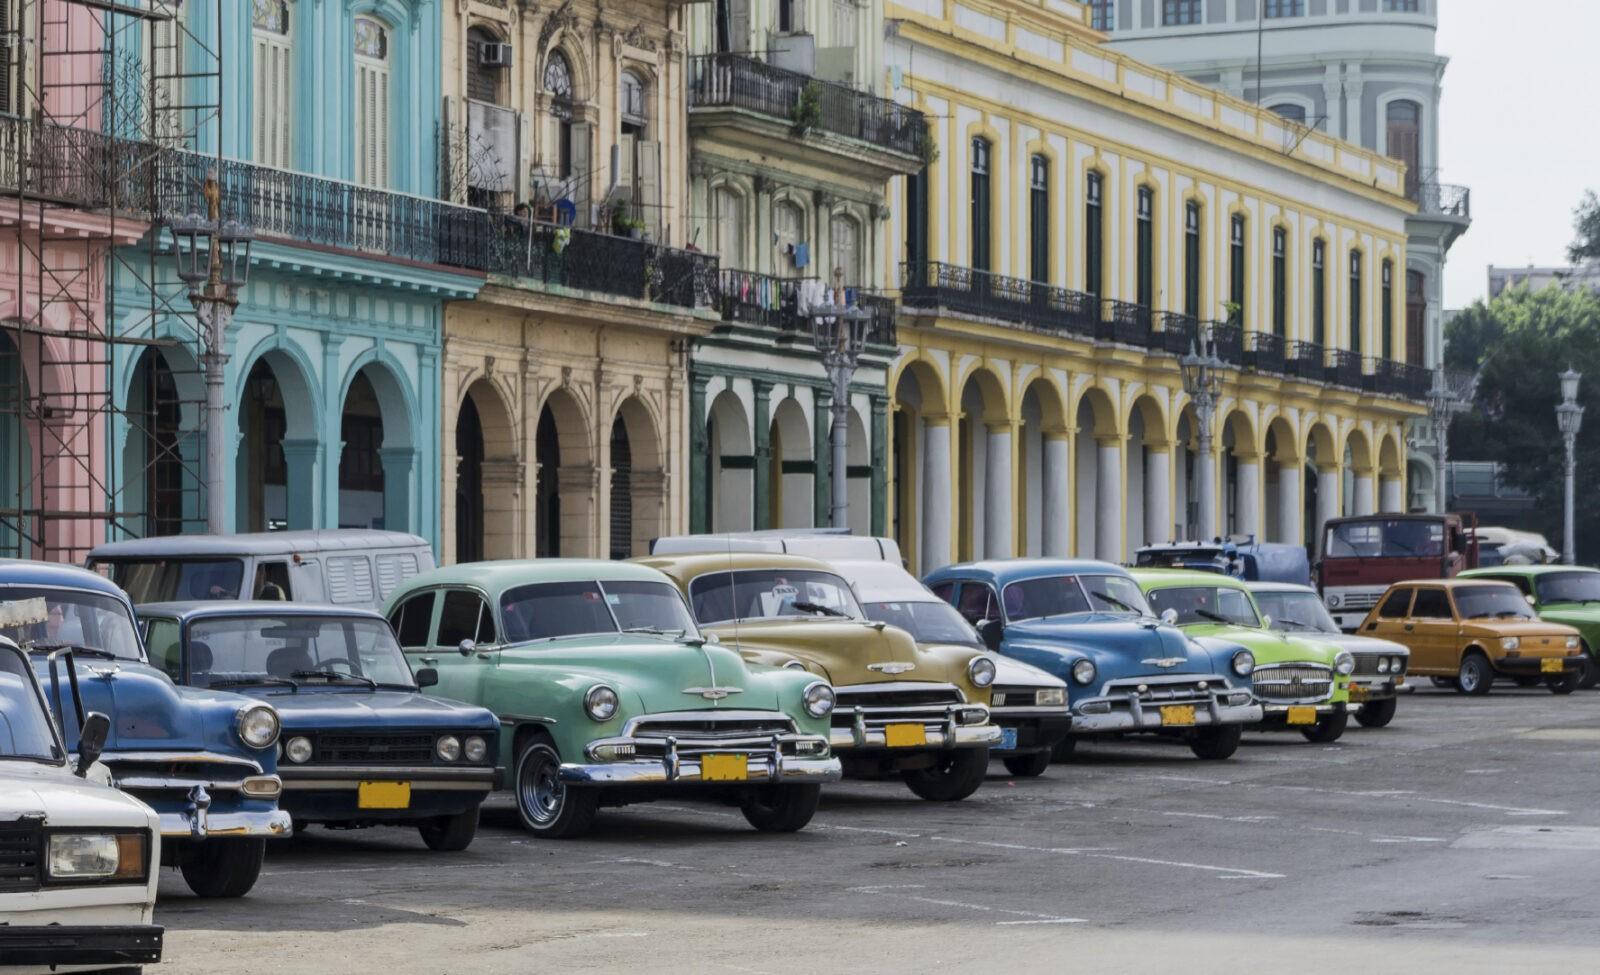 Street scene with vintage car in Havana, Cuba.